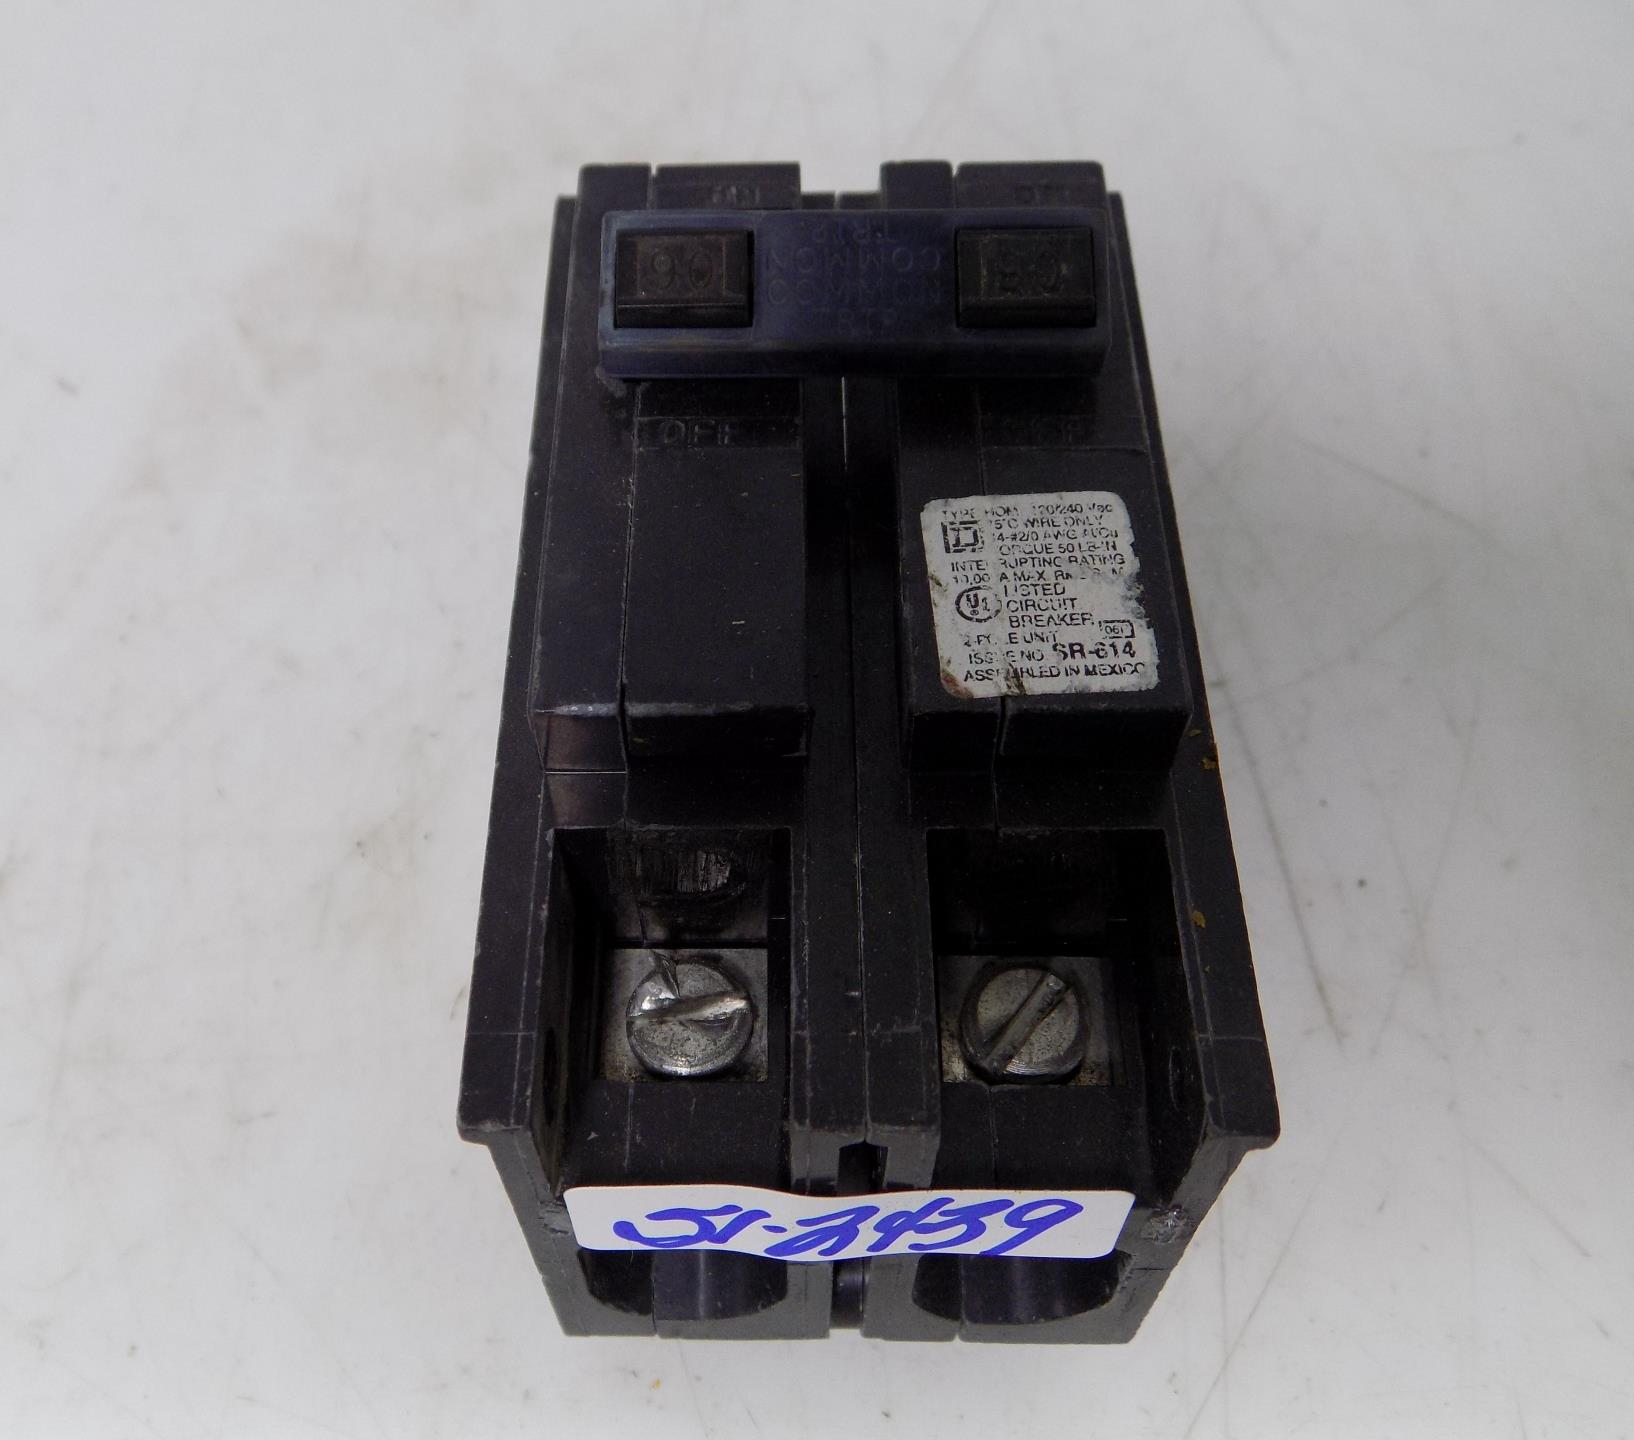 Square D Homeline Electrical Circuit Breaker 90 Amp 2 Pole Standard Trip Plug In